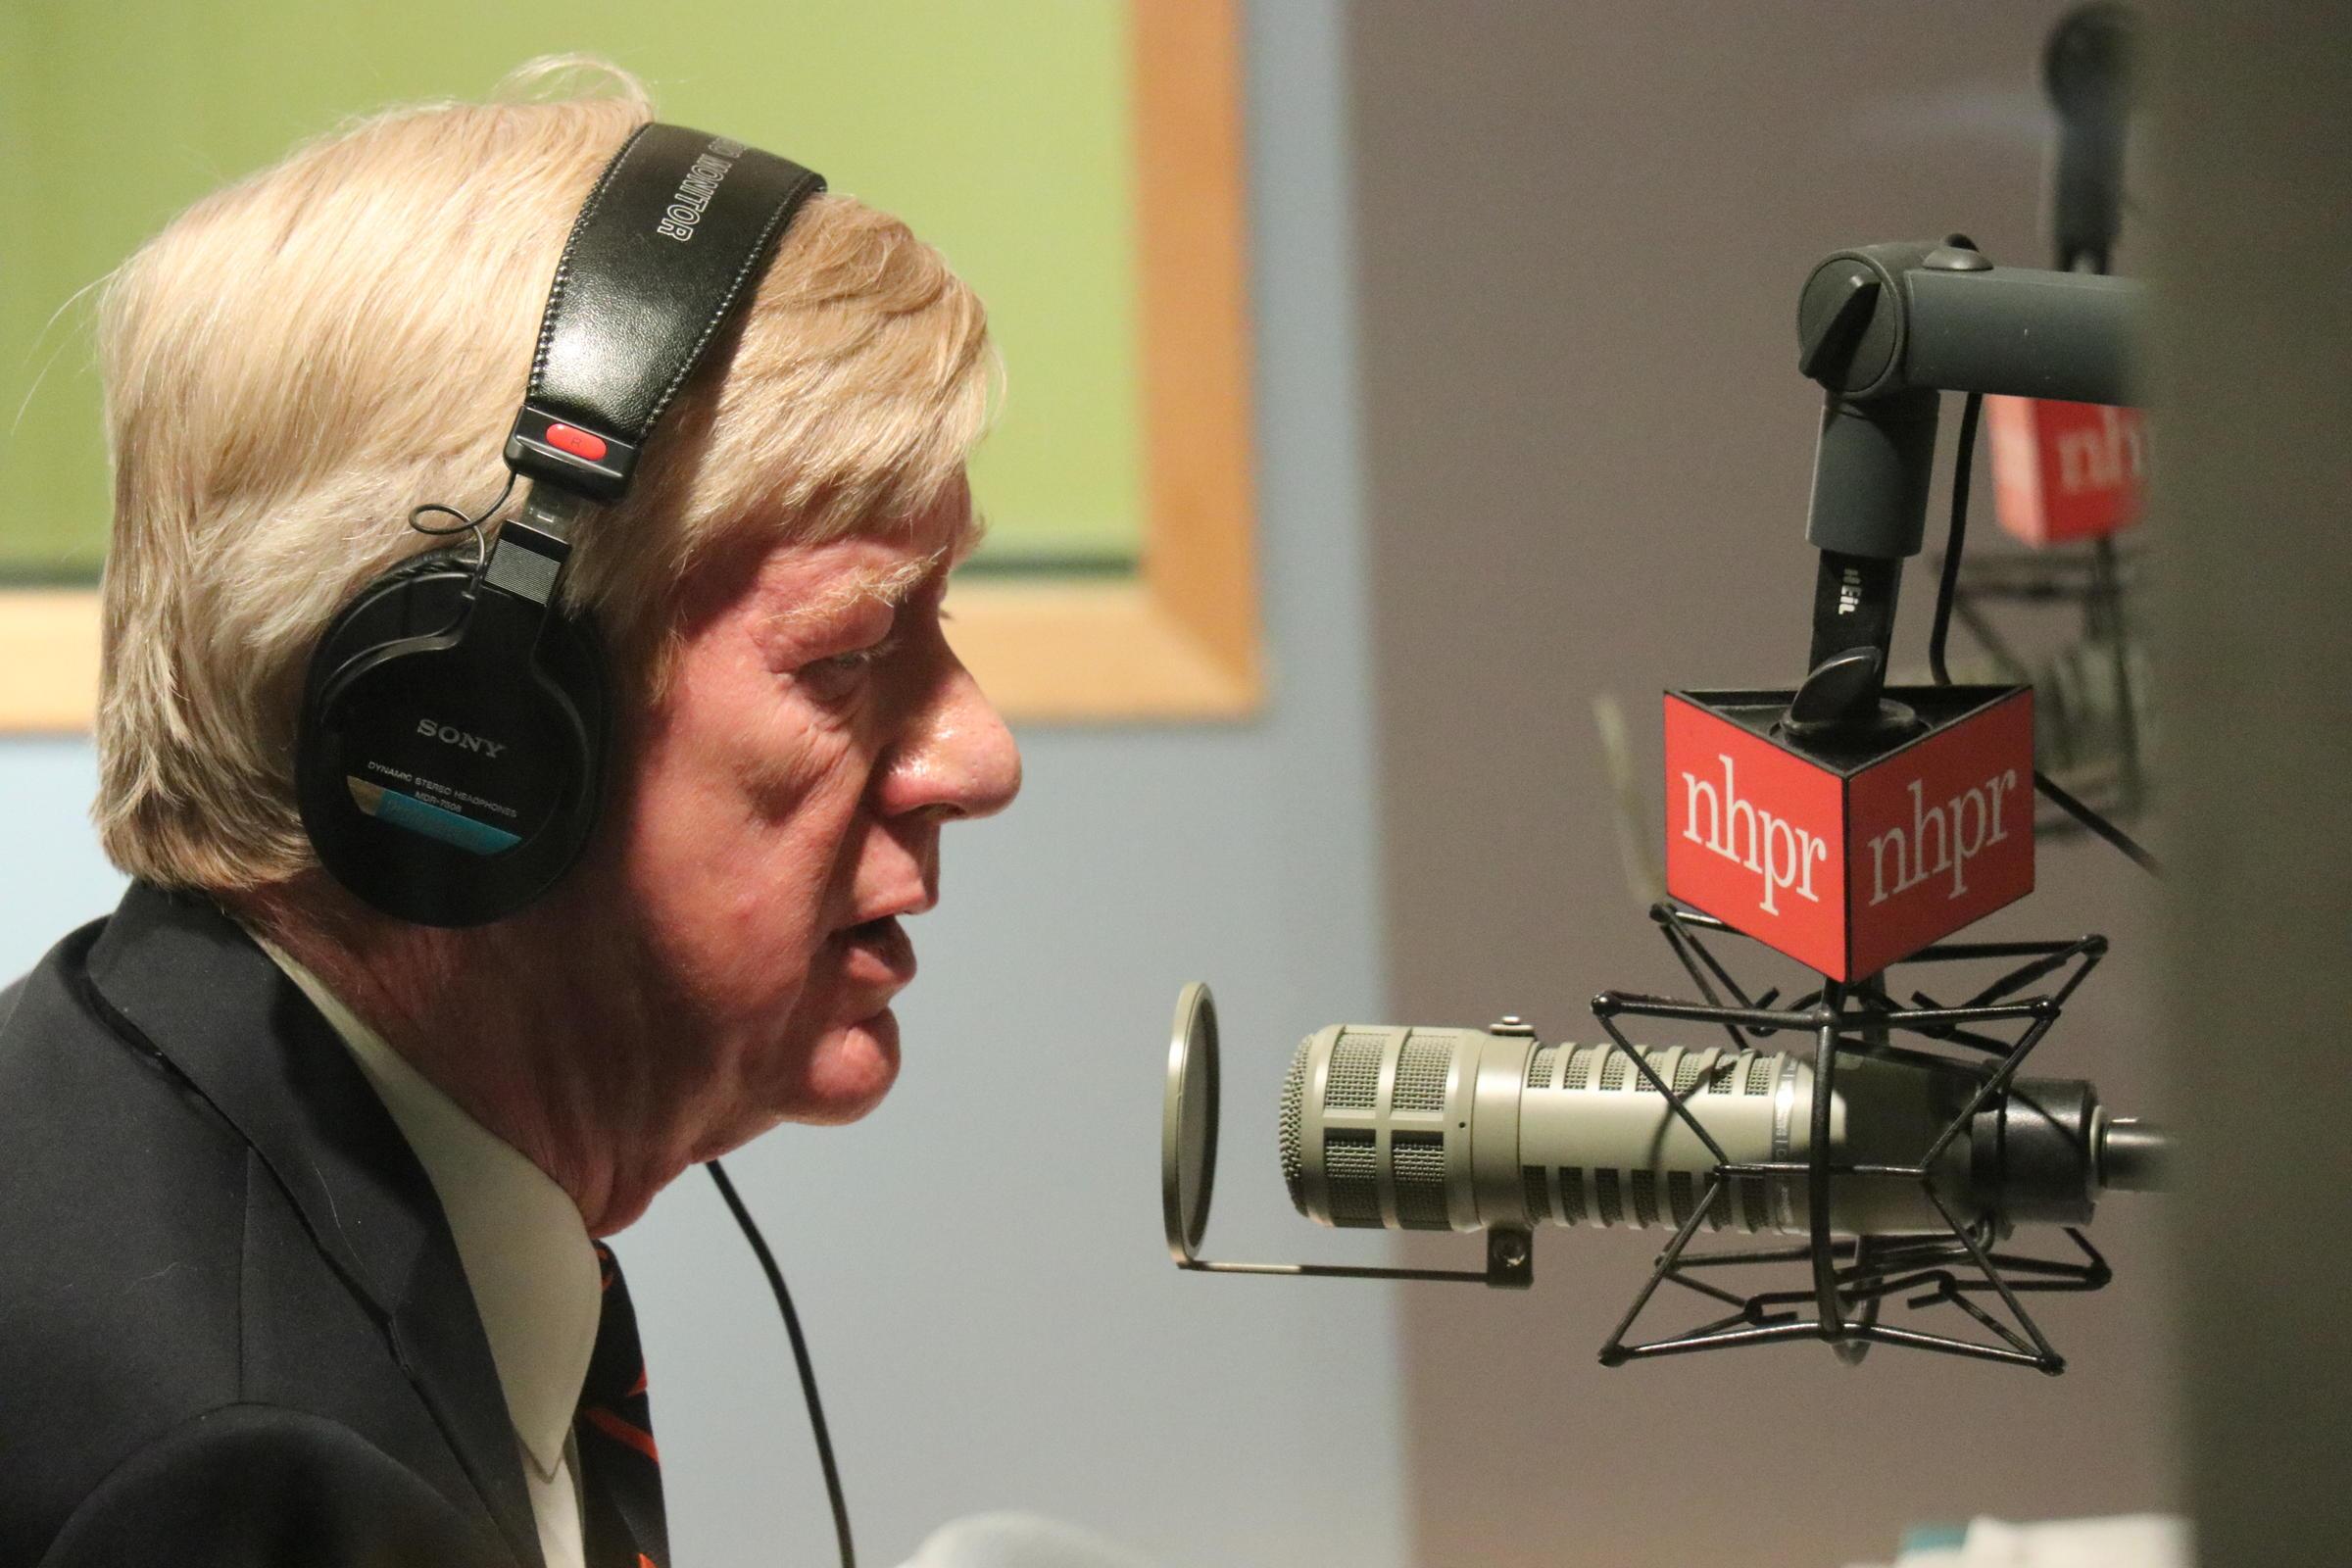 Best Atom Themes 2020 2020 Candidate Conversation: Former Mass. Gov. Bill Weld | New